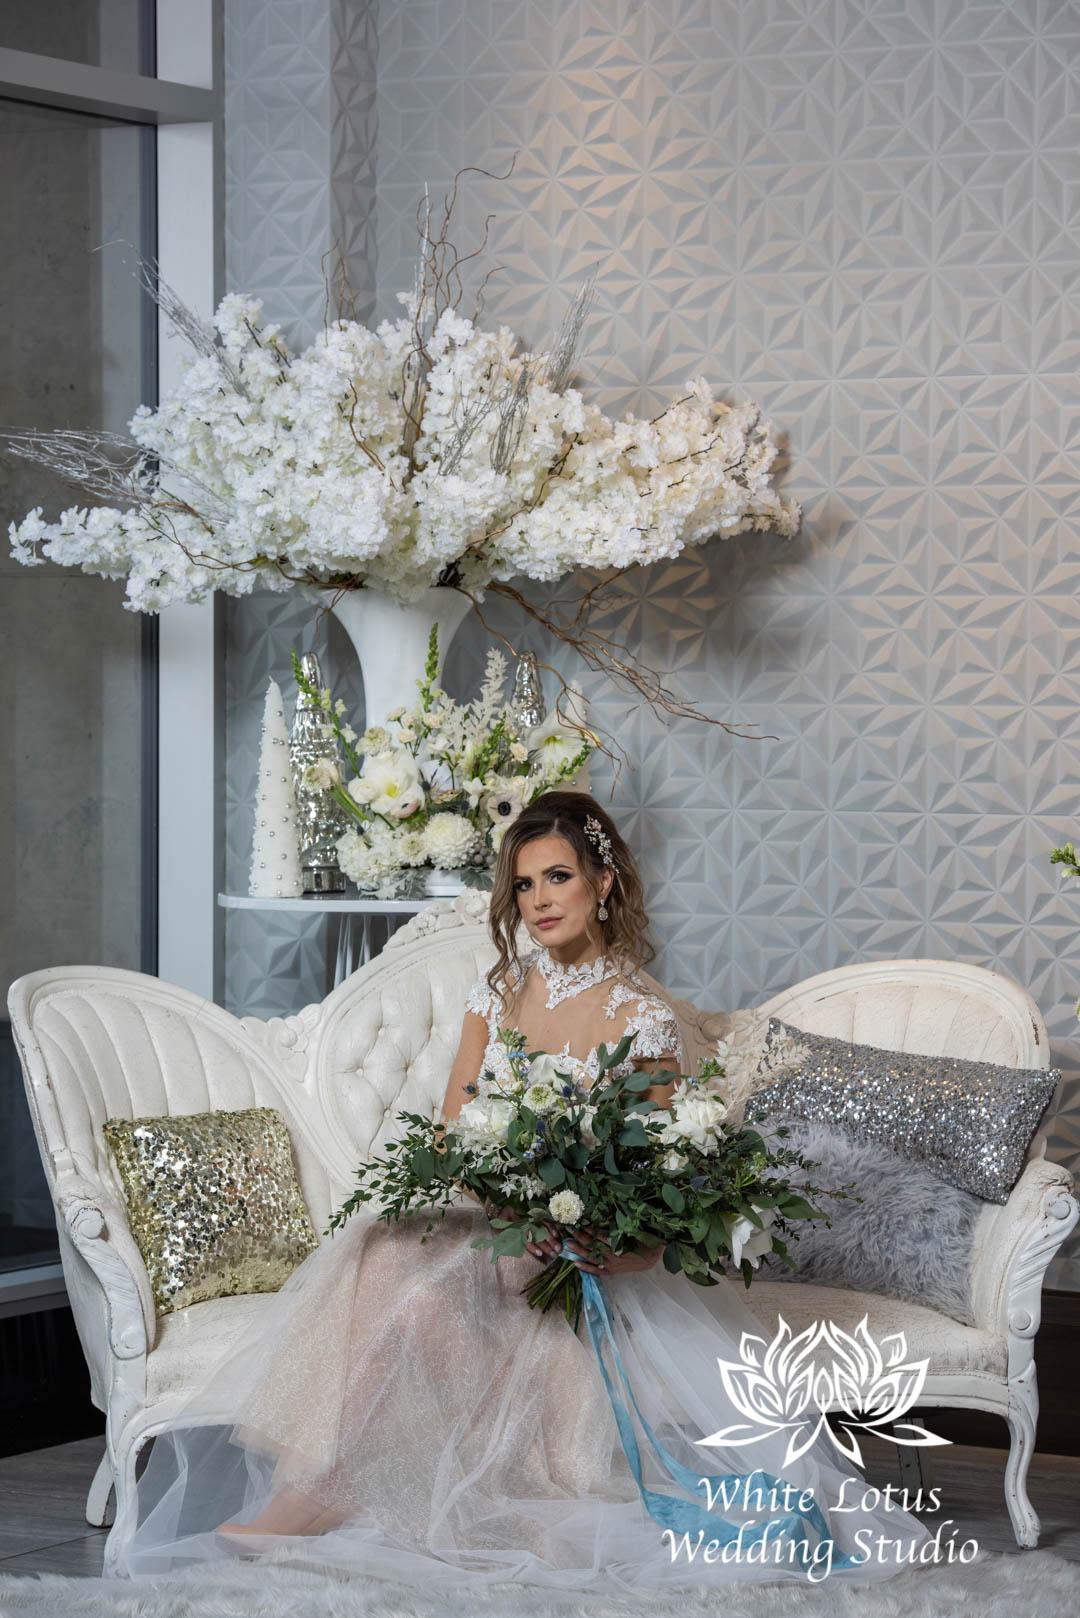 069- GLAM WINTERLUXE WEDDING INSPIRATION